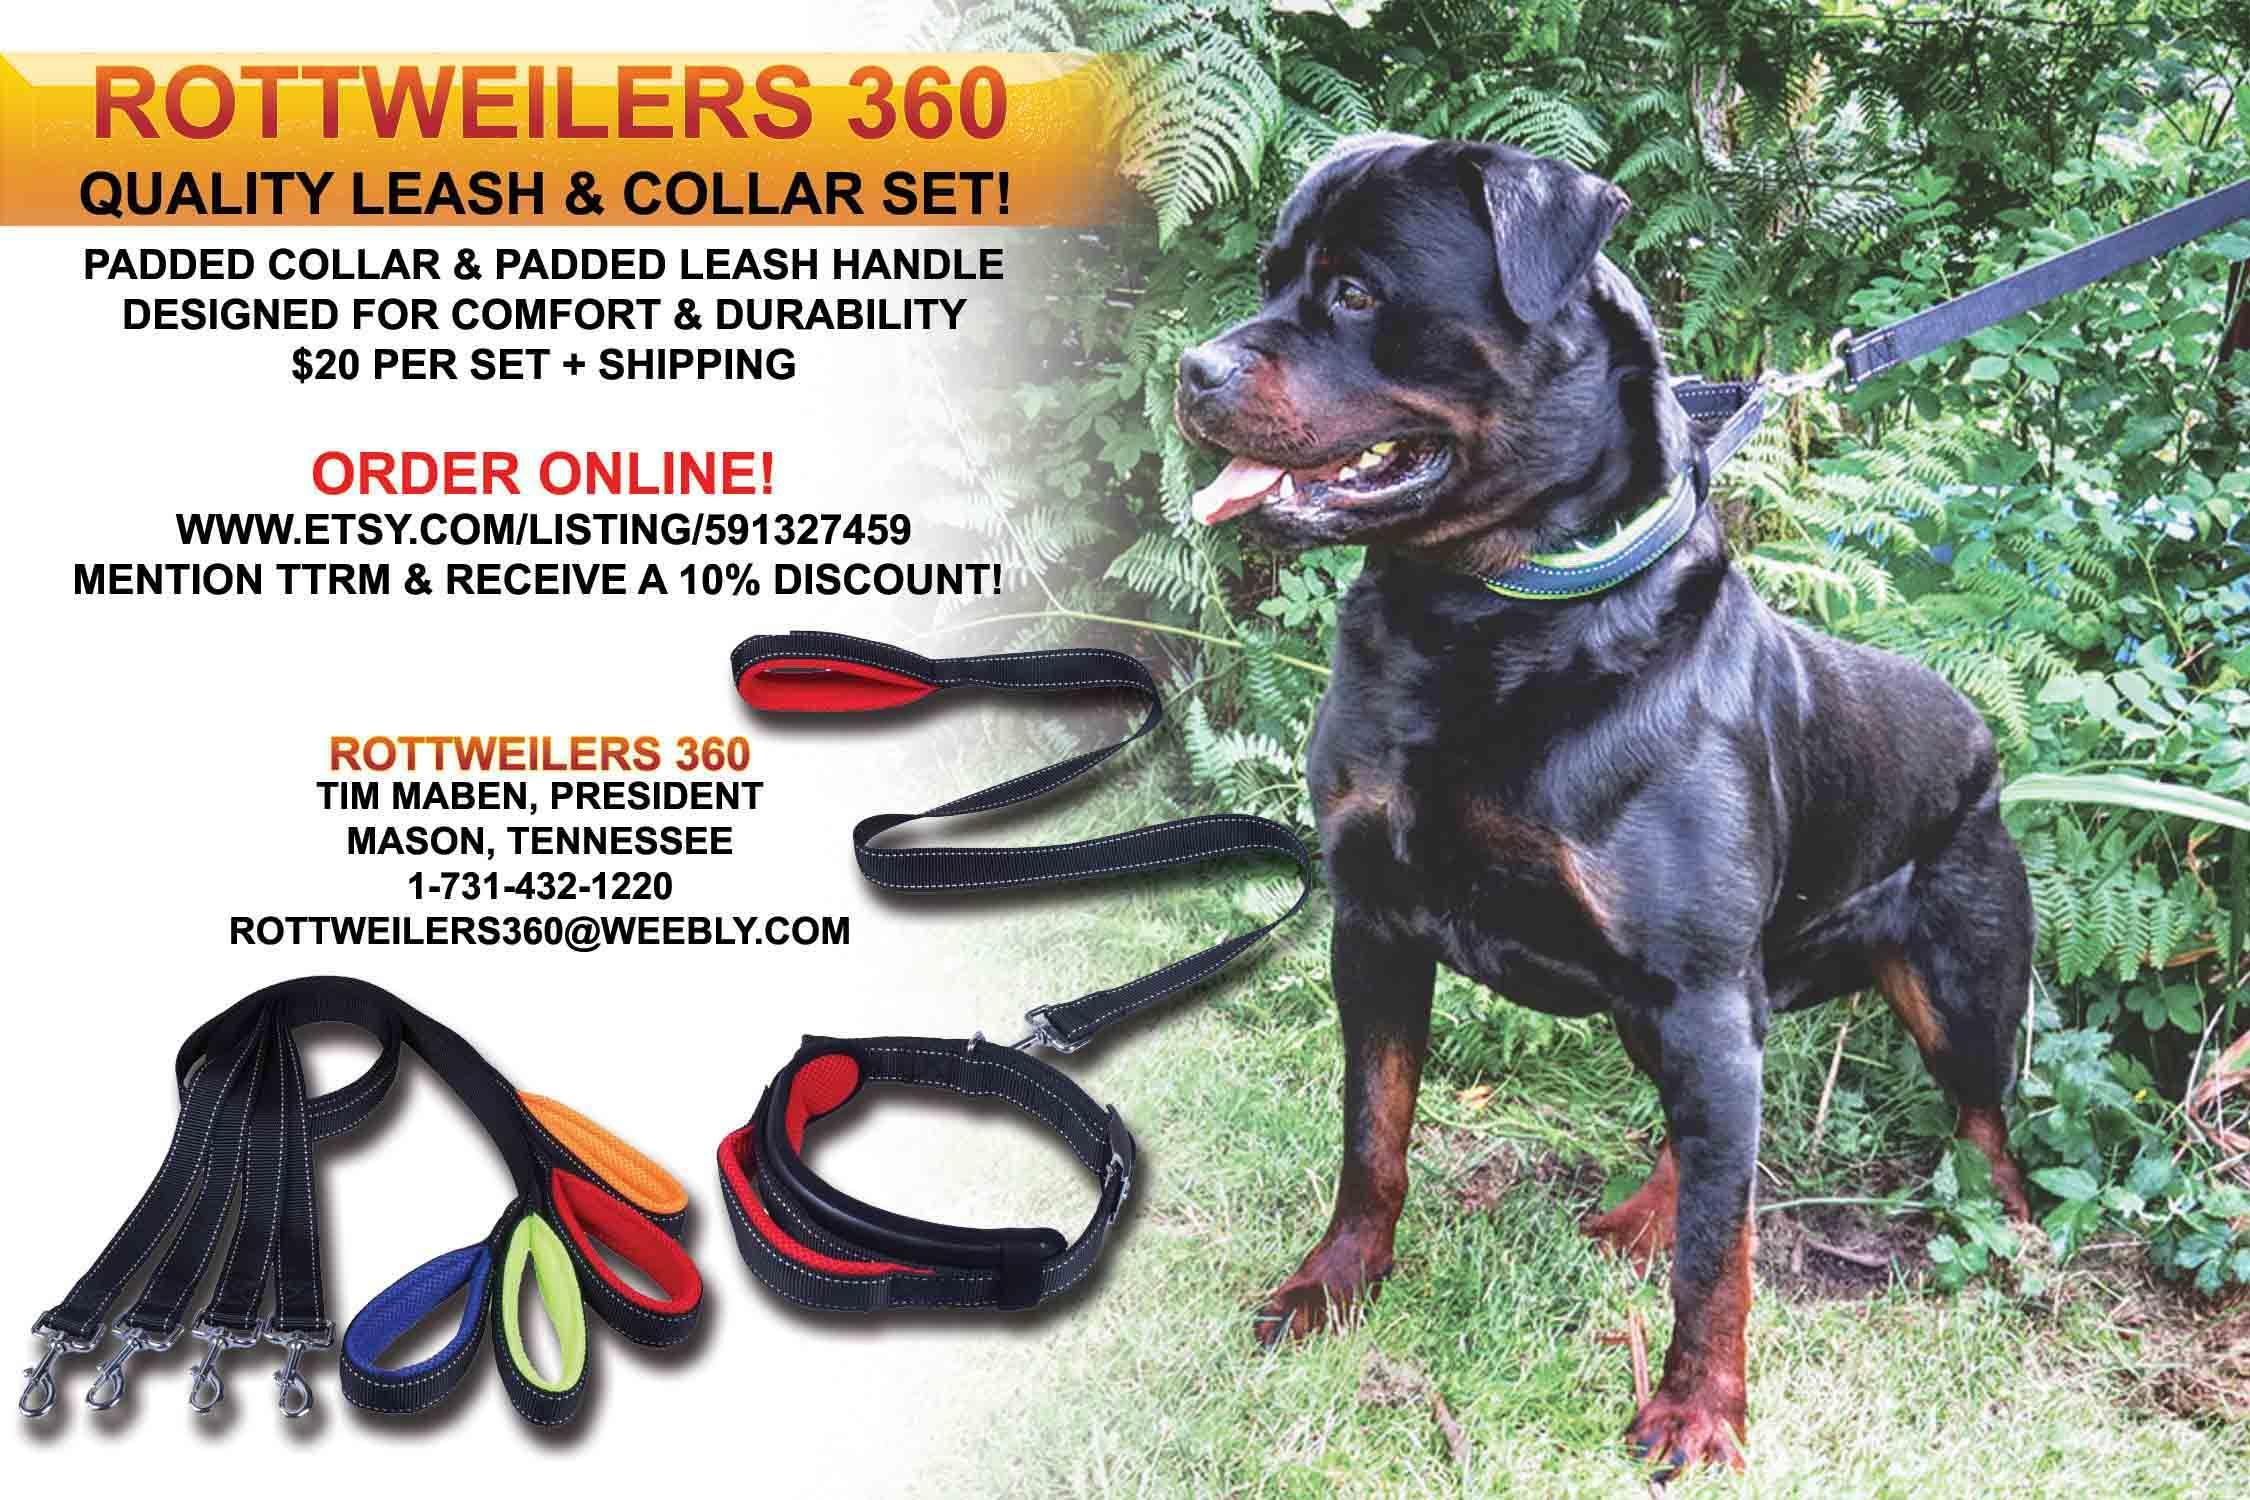 Rottweilers 360 Tim Maben President Mason Tennessee 1 731 432